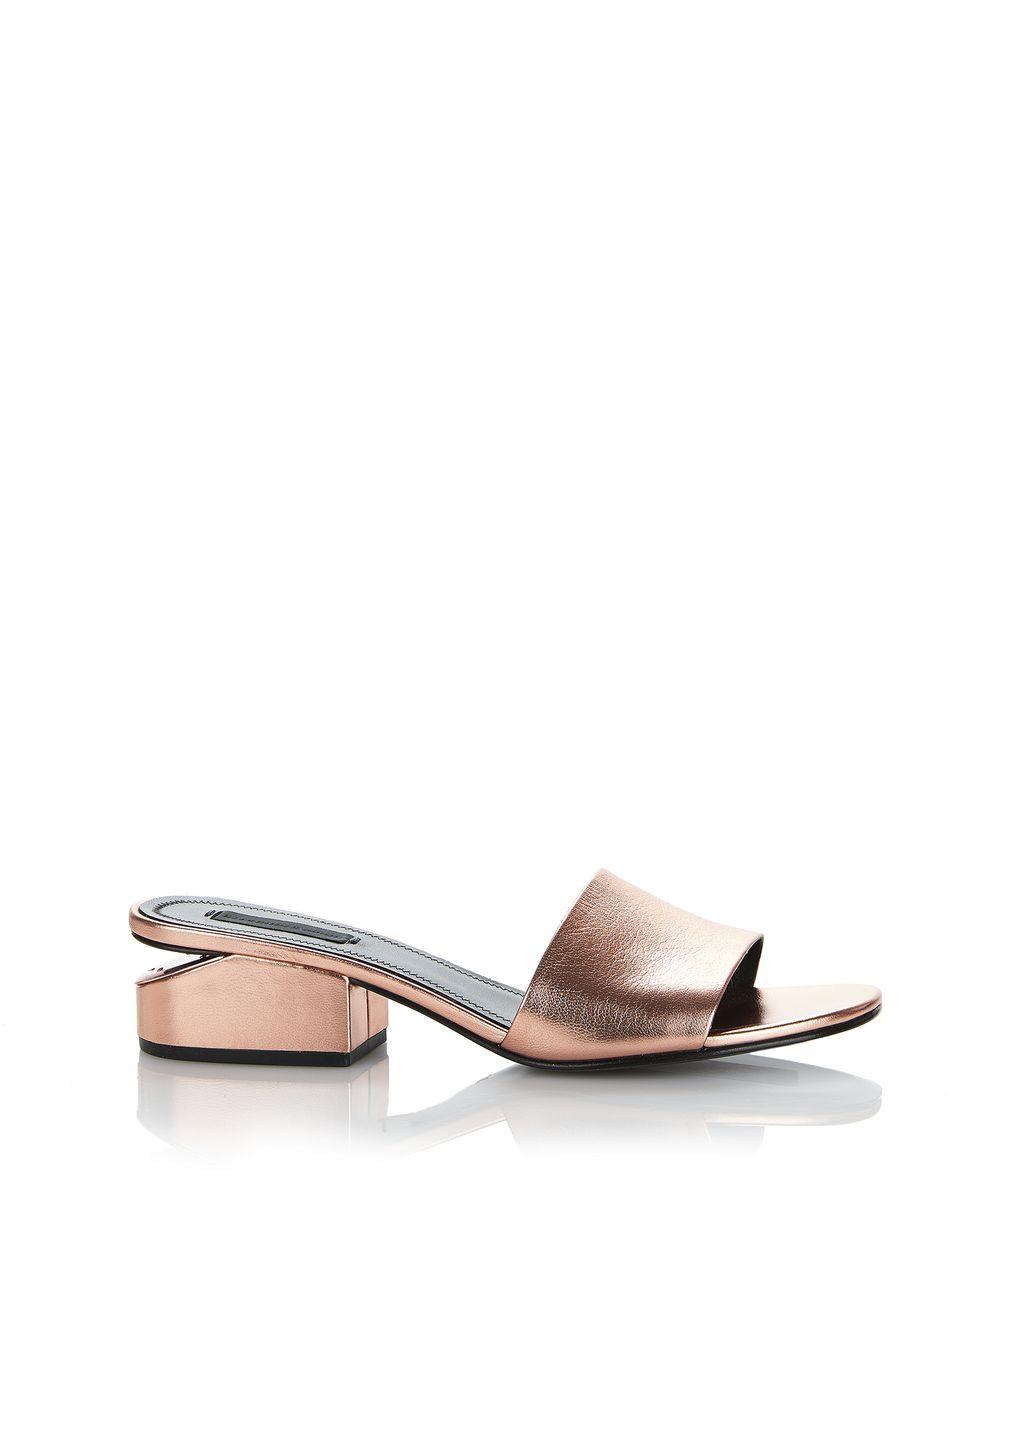 Alexander Wang Woman Lou Metallic Leather Sandals Rose Gold Size 35 Alexander Wang T5r5J1a7cj